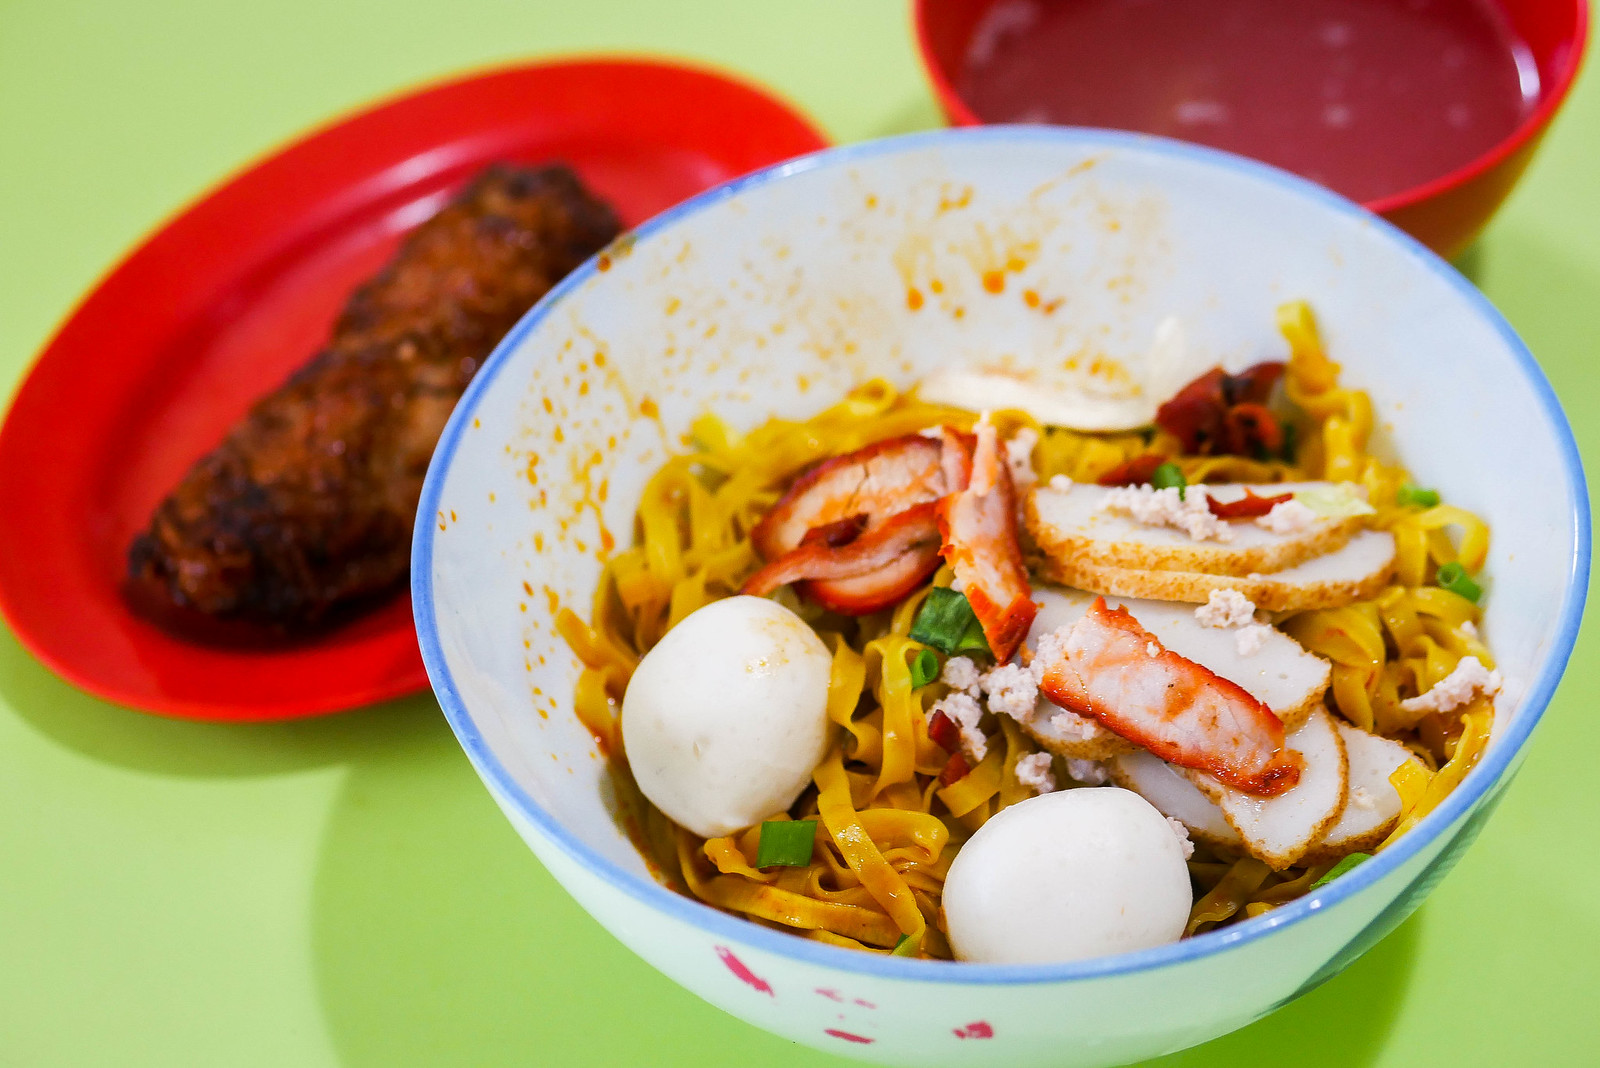 amoy street food centre chicken-9